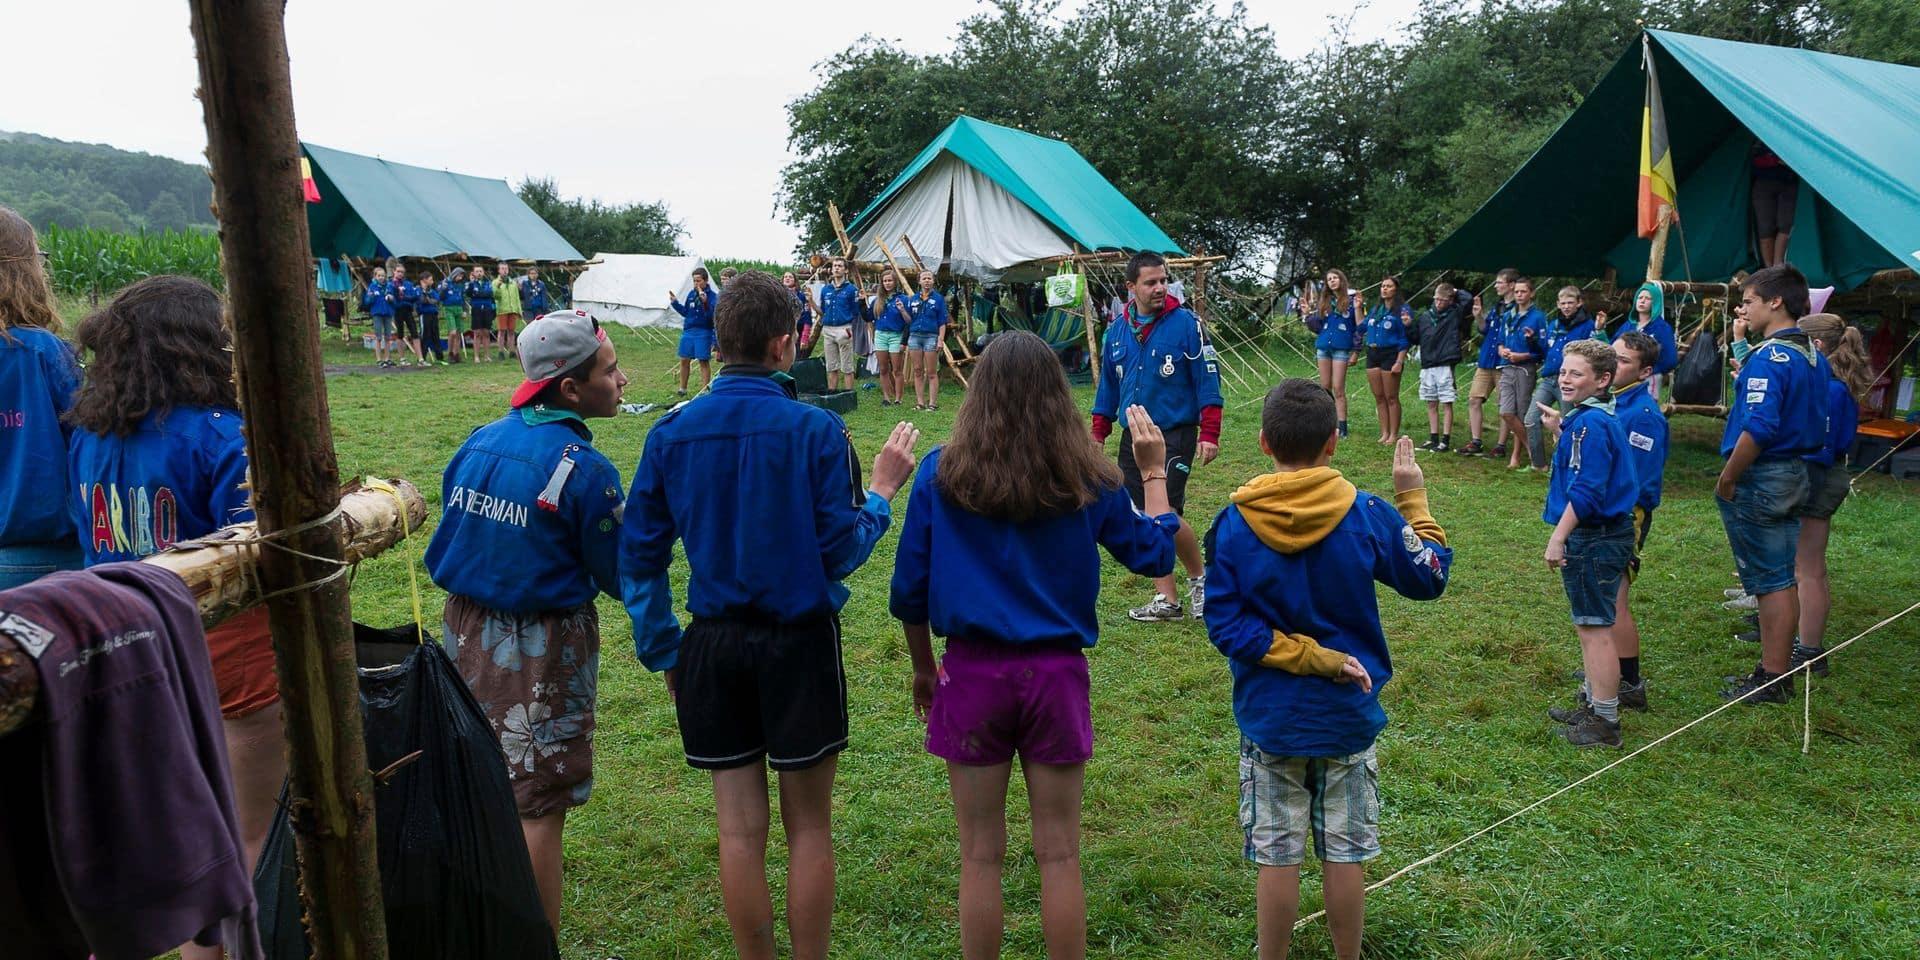 Edito: scouts toujours et ensemble